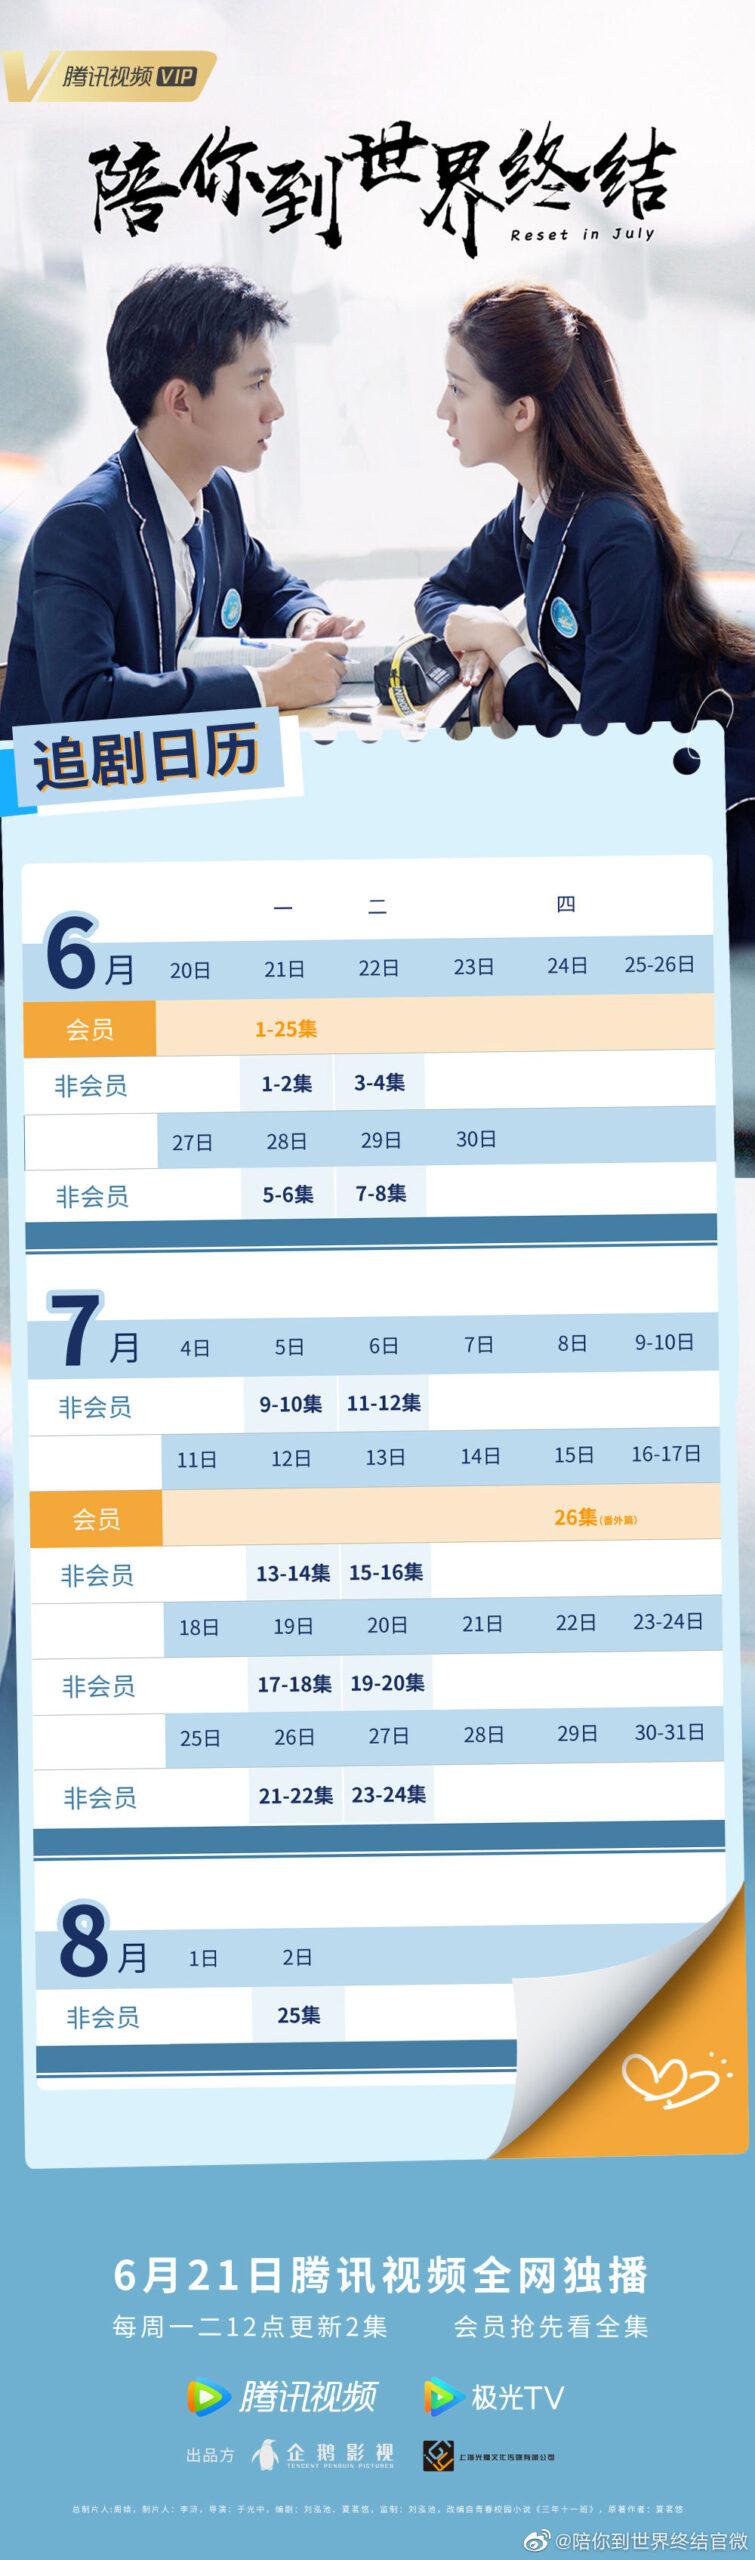 Reset In July Chinese Drama Airing Calendar